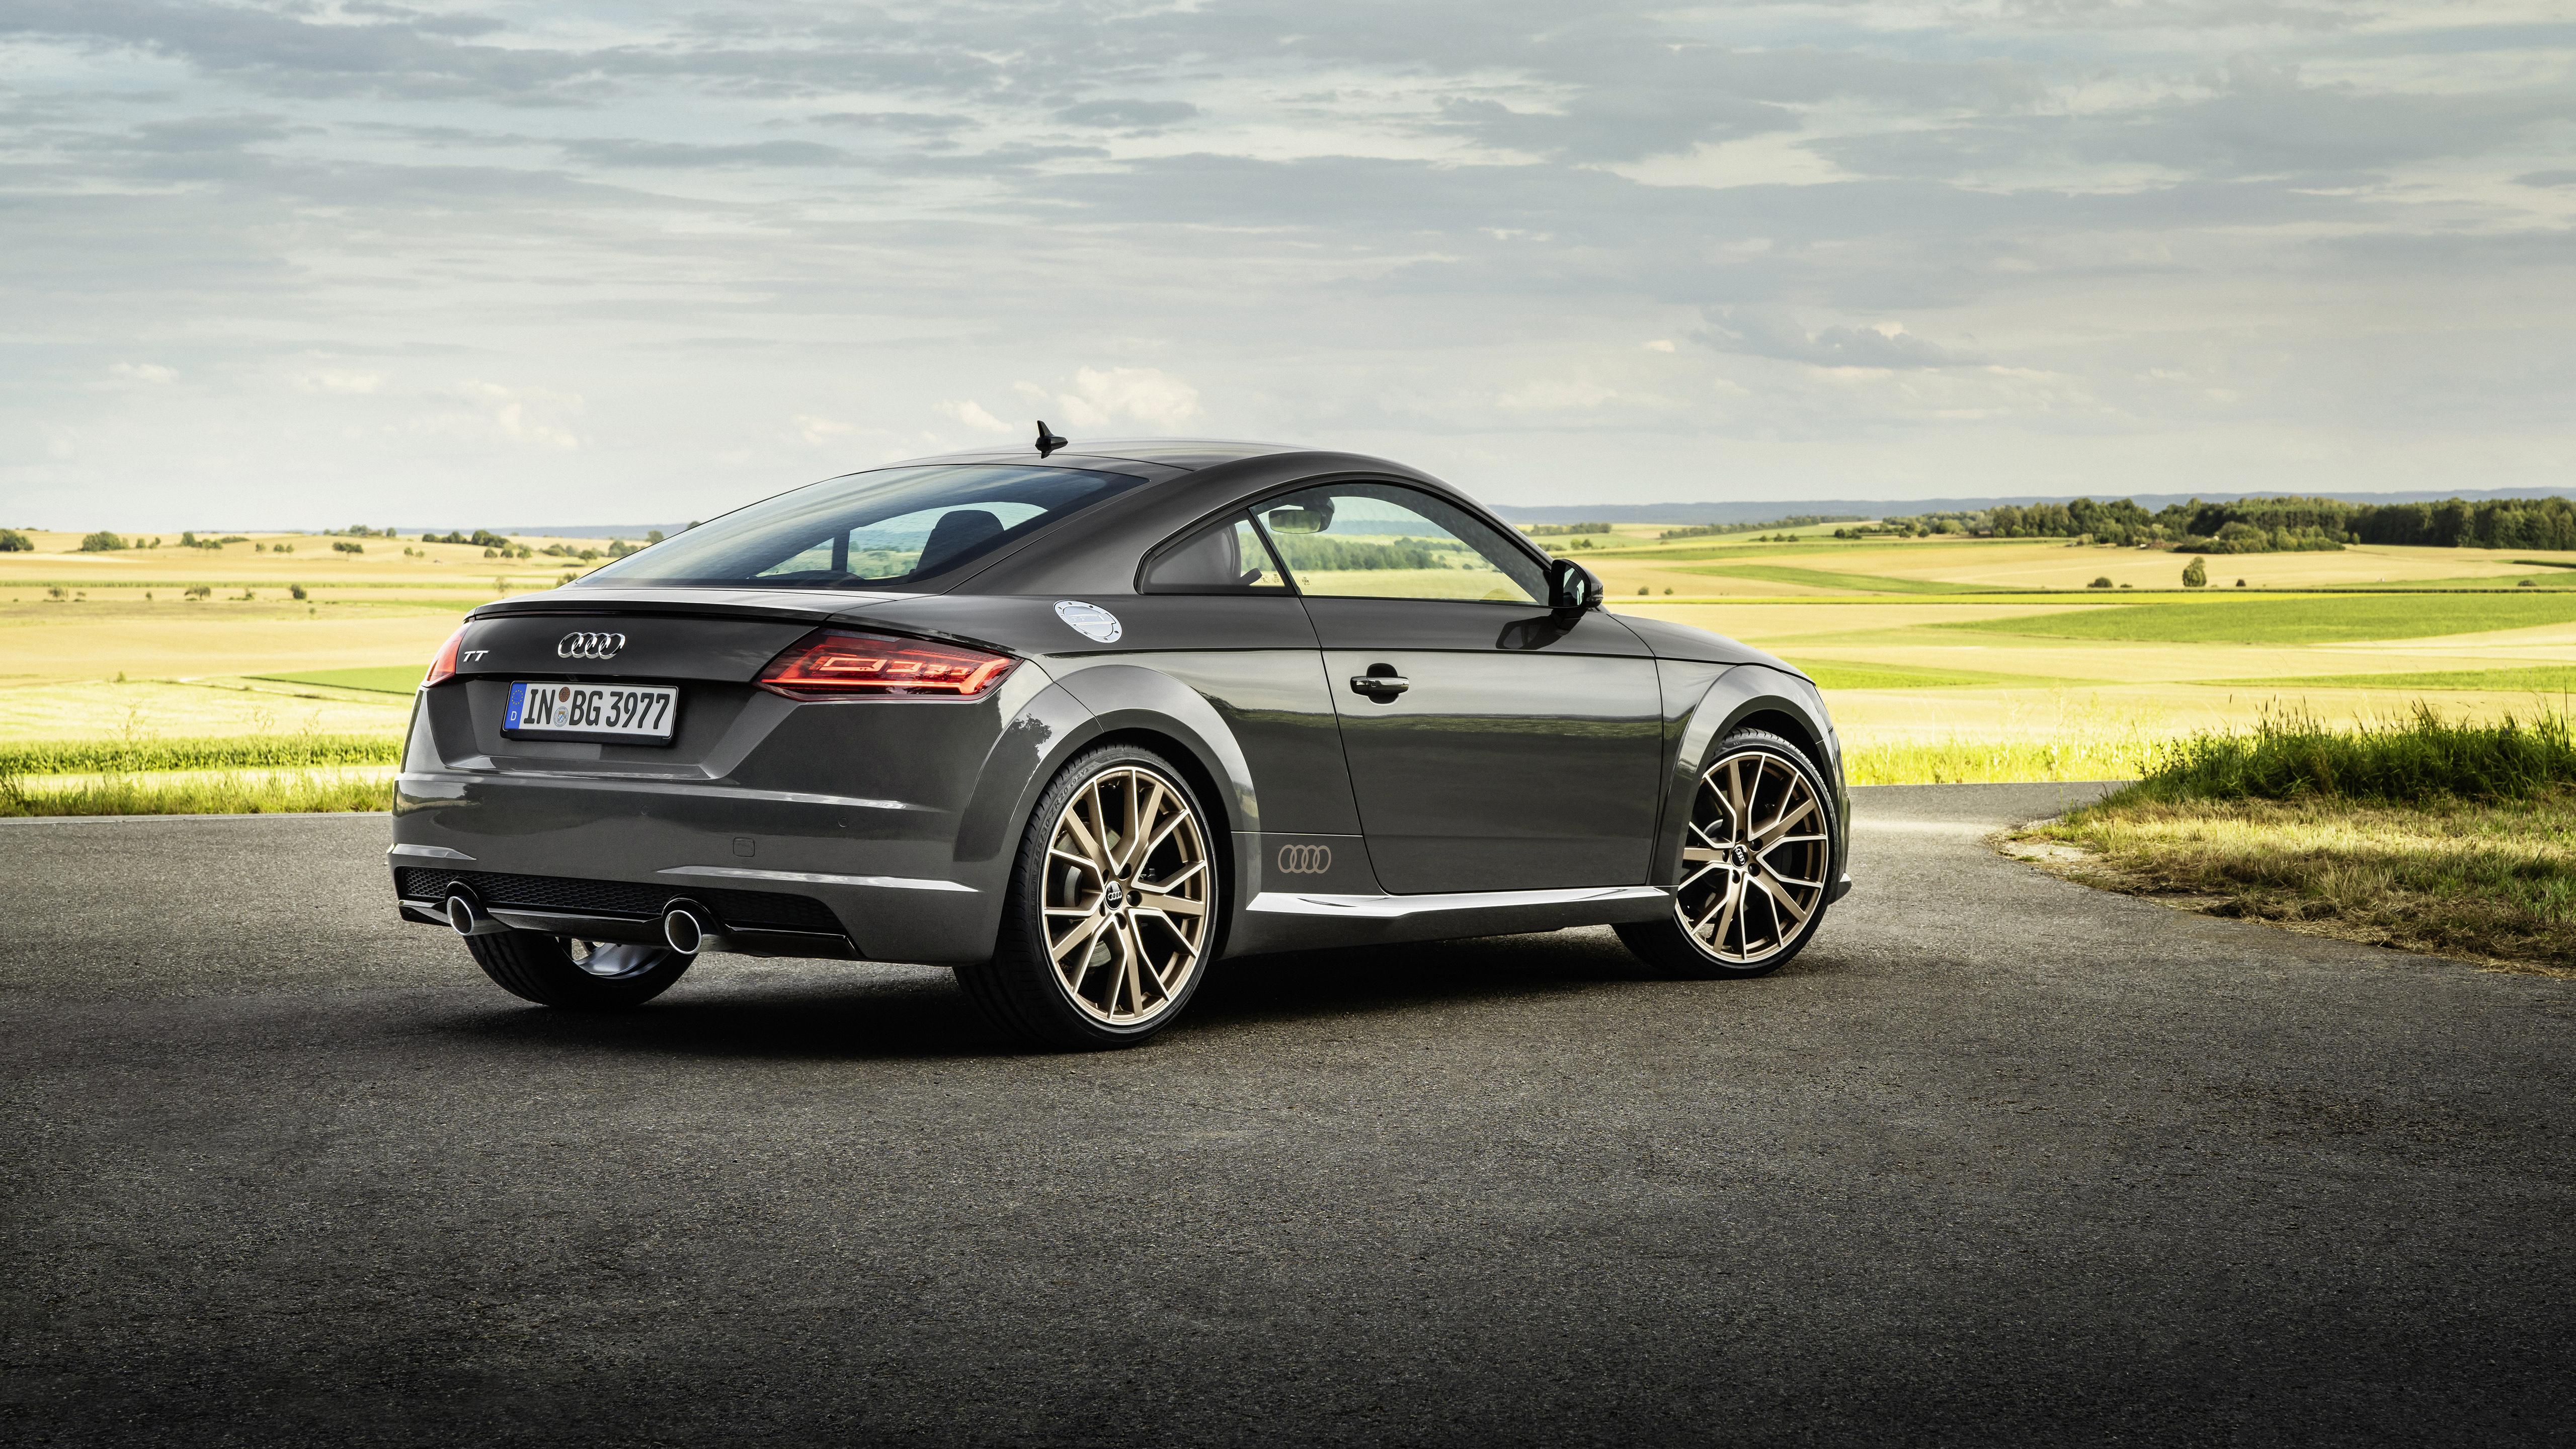 Audi TT Coupé bronze selection 2021 5K 2 Wallpaper | HD ...